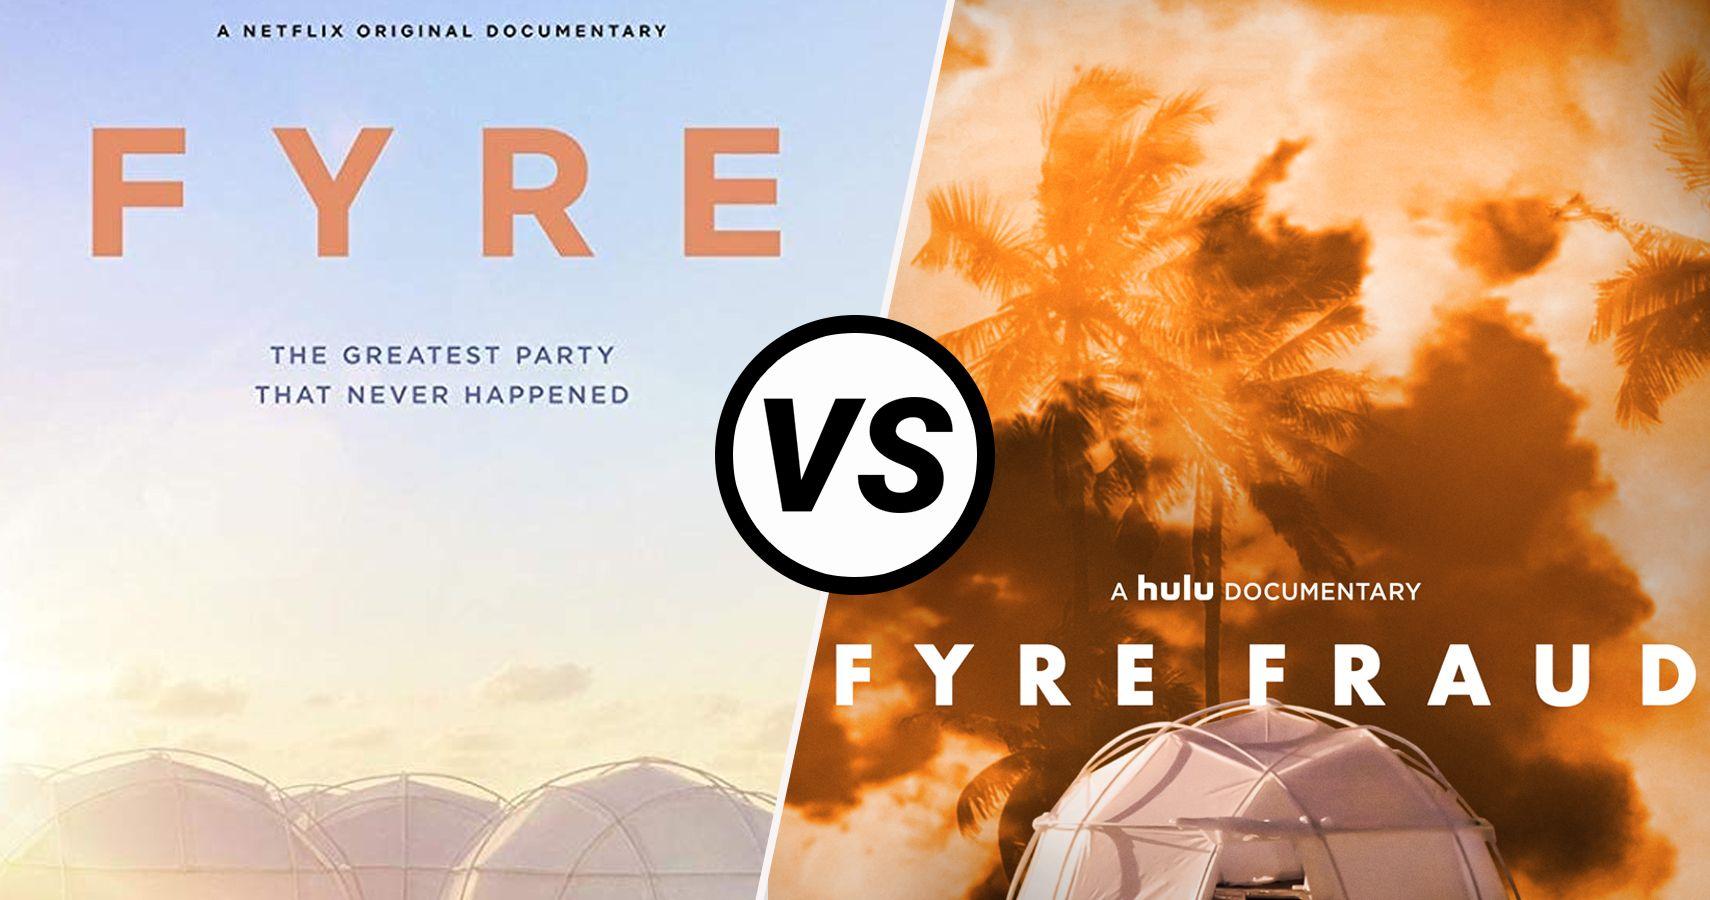 Netflix Vs Hulu: Which Fyre Fest Documentary Should You Watch?